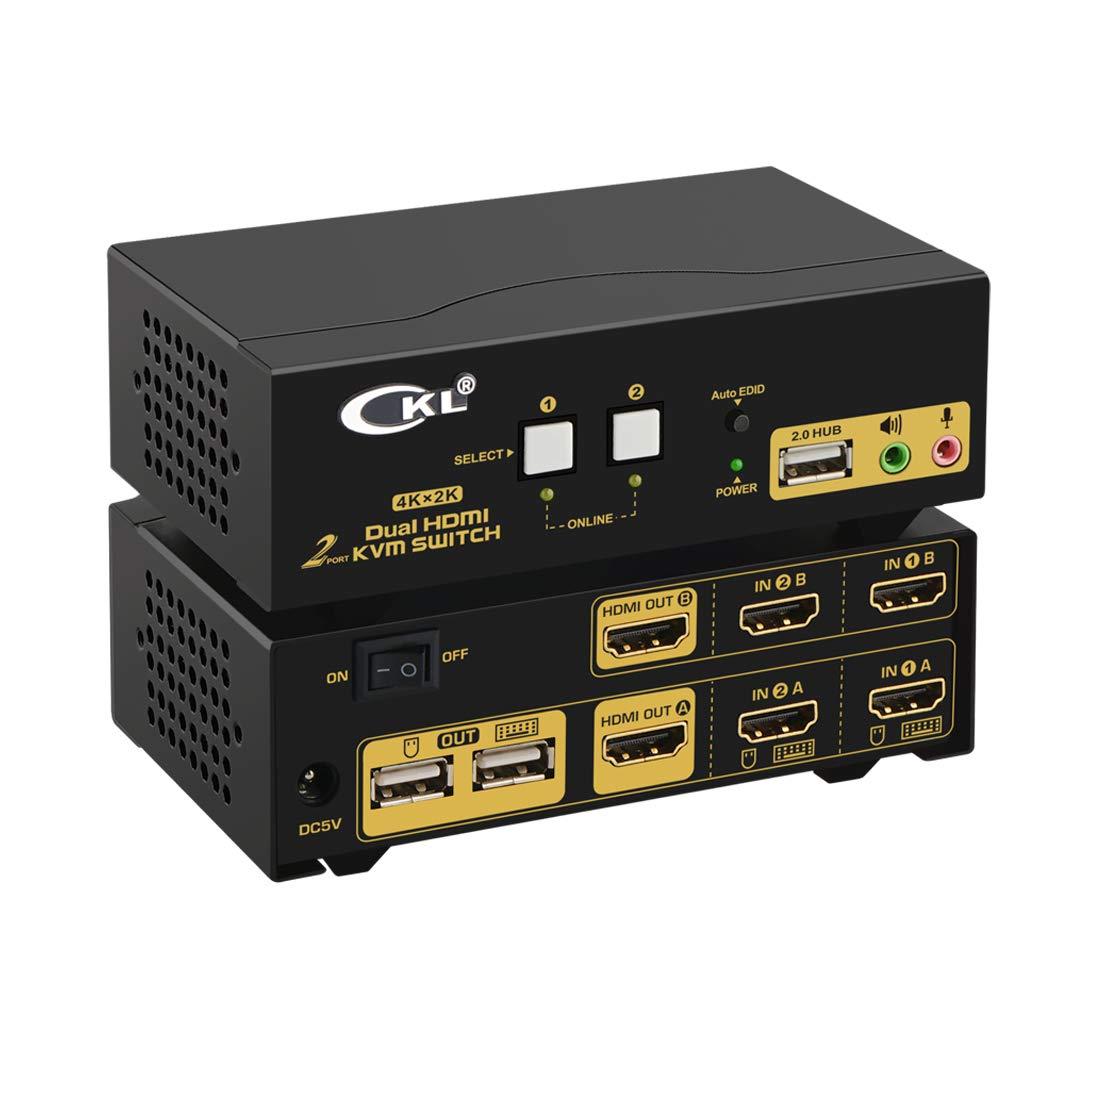 CKL HDMI KVM Switch 2 Port Dual Monitor Extended Display (CKL-922HUA) by CKL